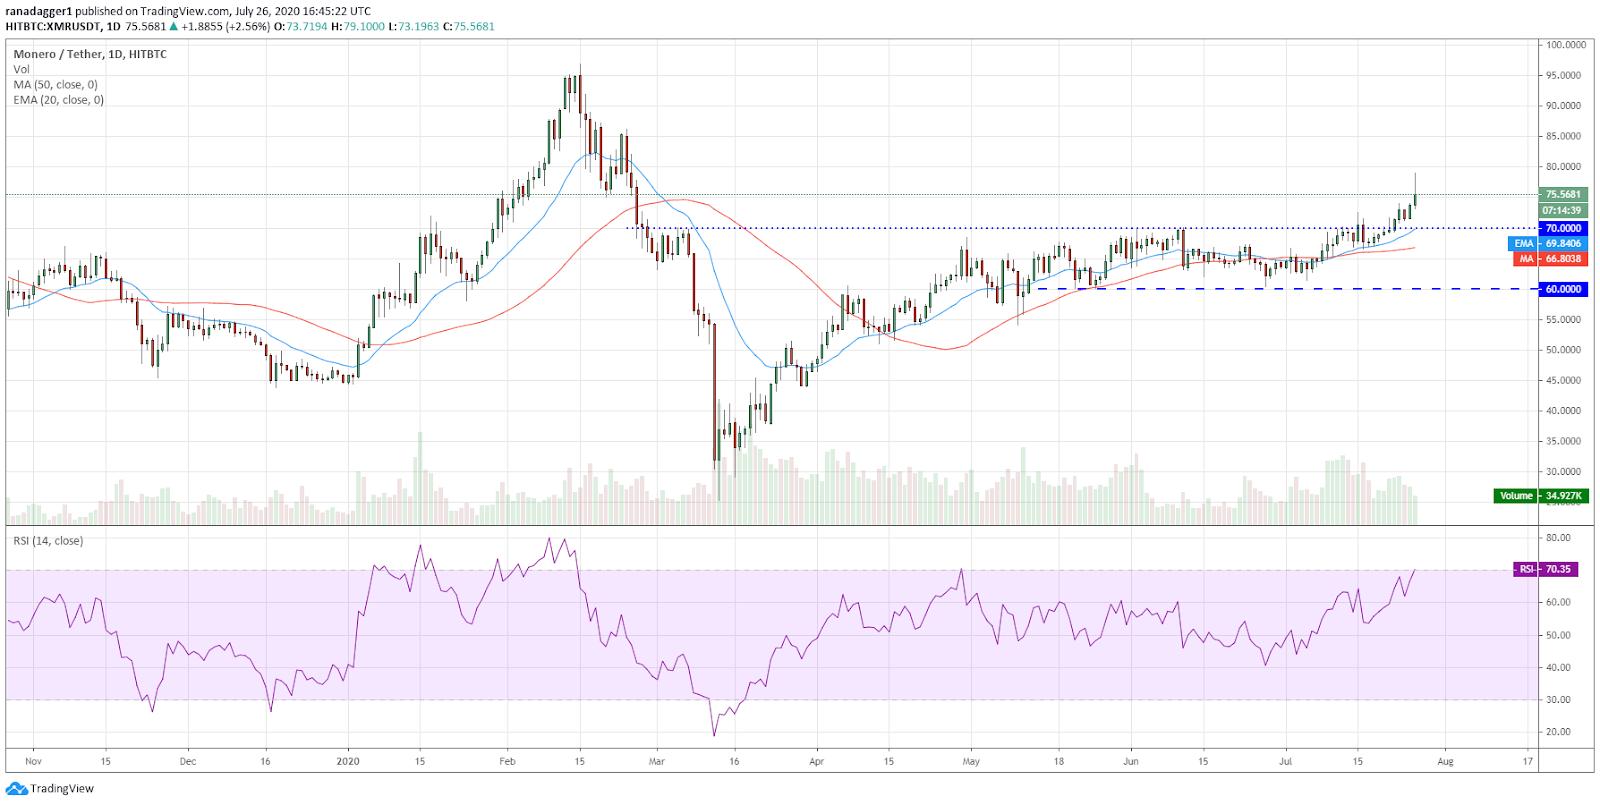 XMR/USD daily chart